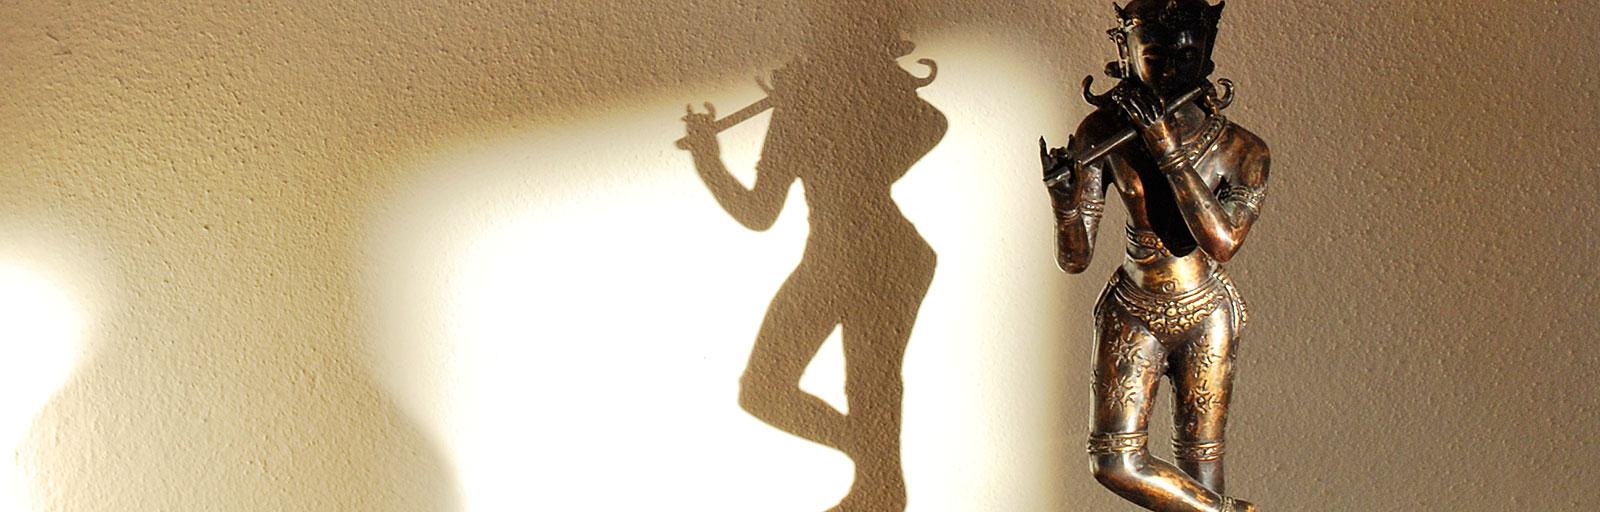 Meditation & Yoga Retreats in Mexico: Krisha Plays with Light and Shadow